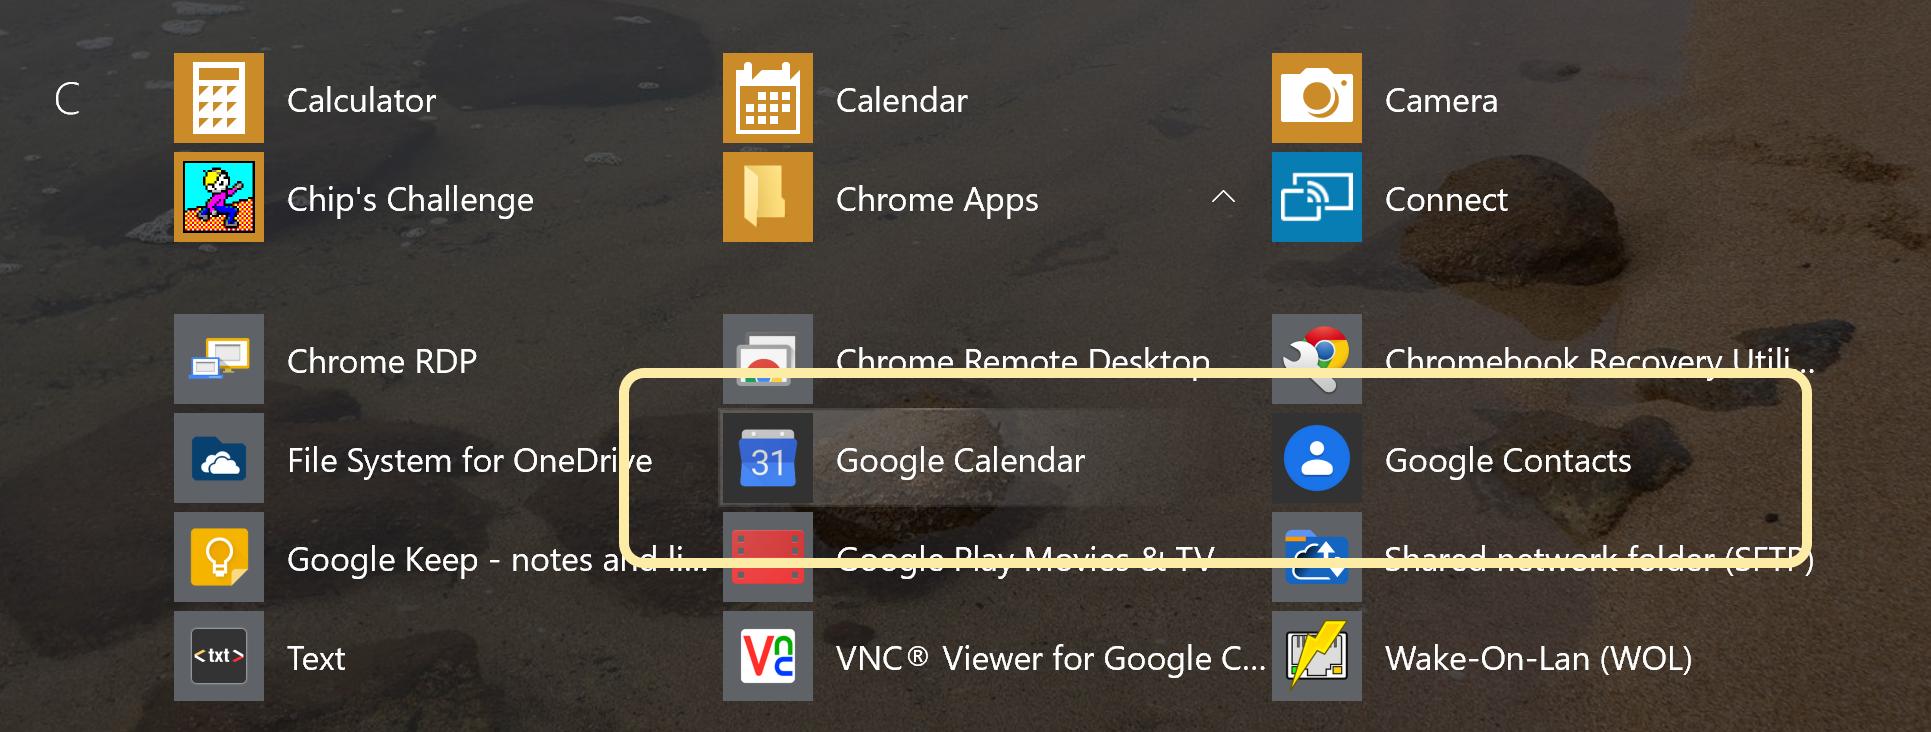 Chrome WebApp icons OK in AllApps, blank/grey in PinnedTiles